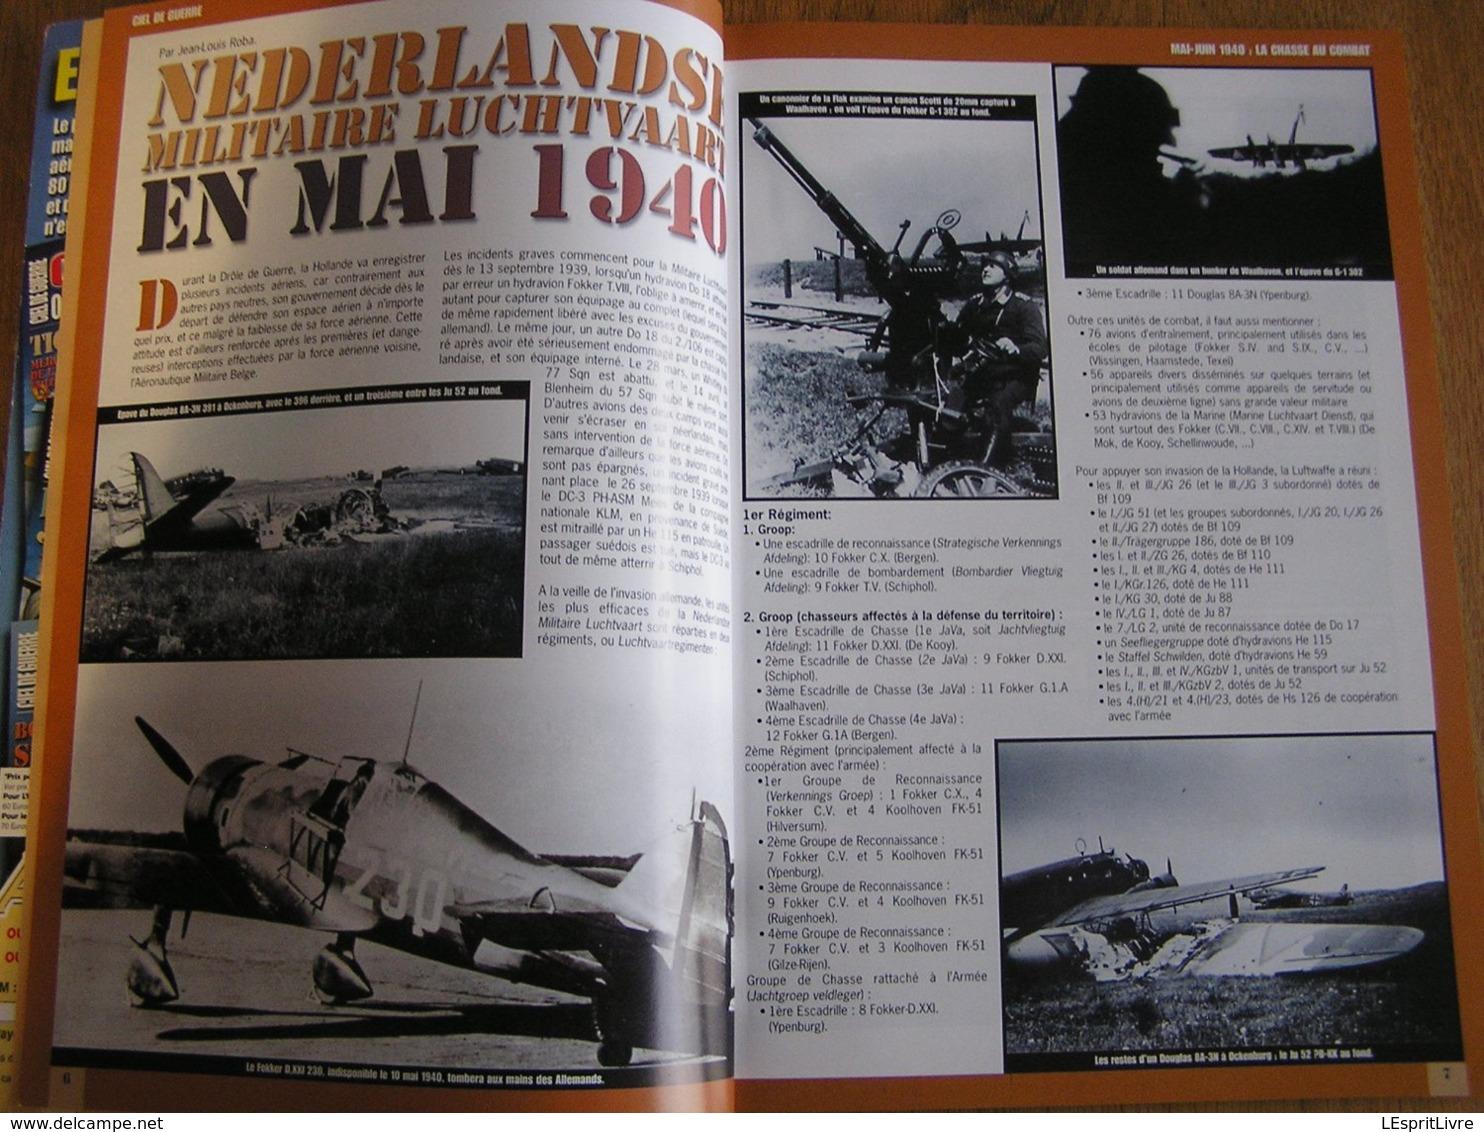 CIEL DE GUERRE N° 8 LA CHASSE AU COMBAT 1 Guerre 40 45 Aviation Nederlands Belgique BAF Armée De L'Air France Jagdwaffe - Oorlog 1939-45